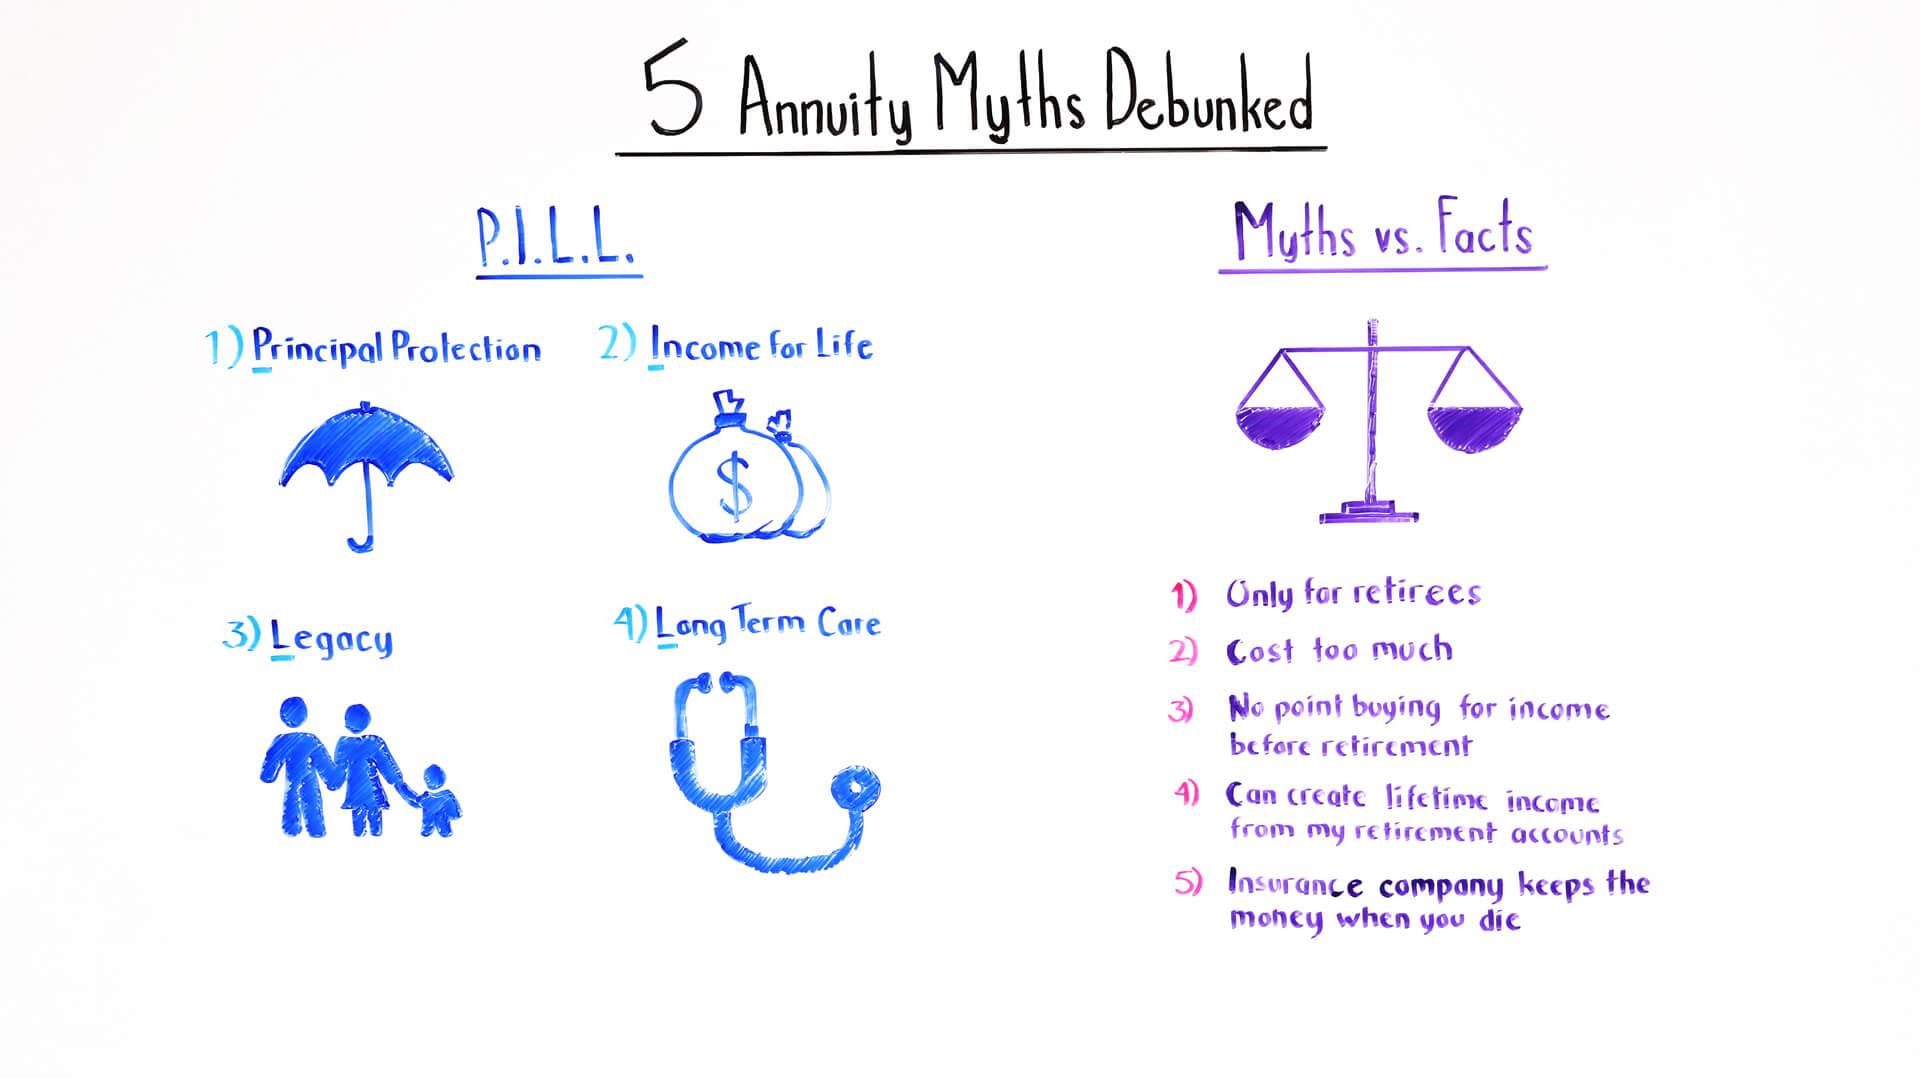 5 Annuity Myths Debunked